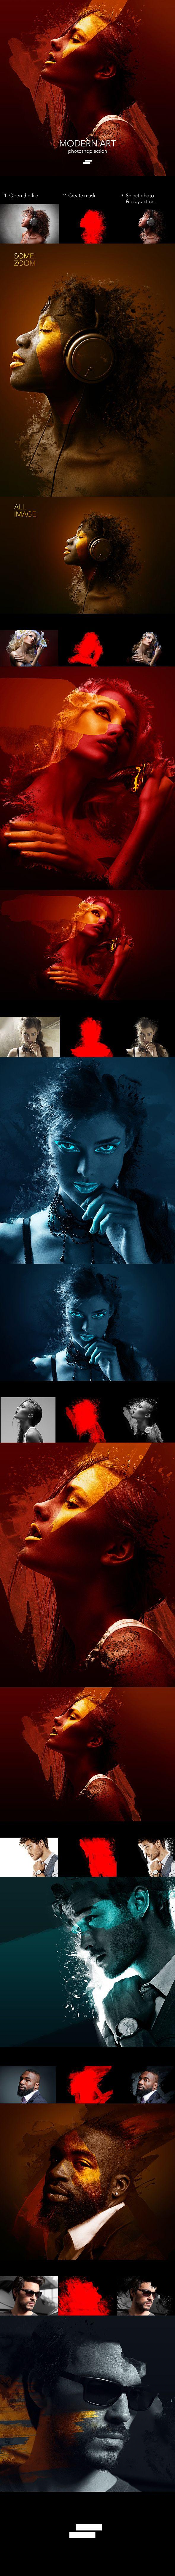 Modern Art Photoshop Action #photoeffect Download: http://graphicriver.net/item/modern-art-photoshop-action/13590241?ref=ksioks